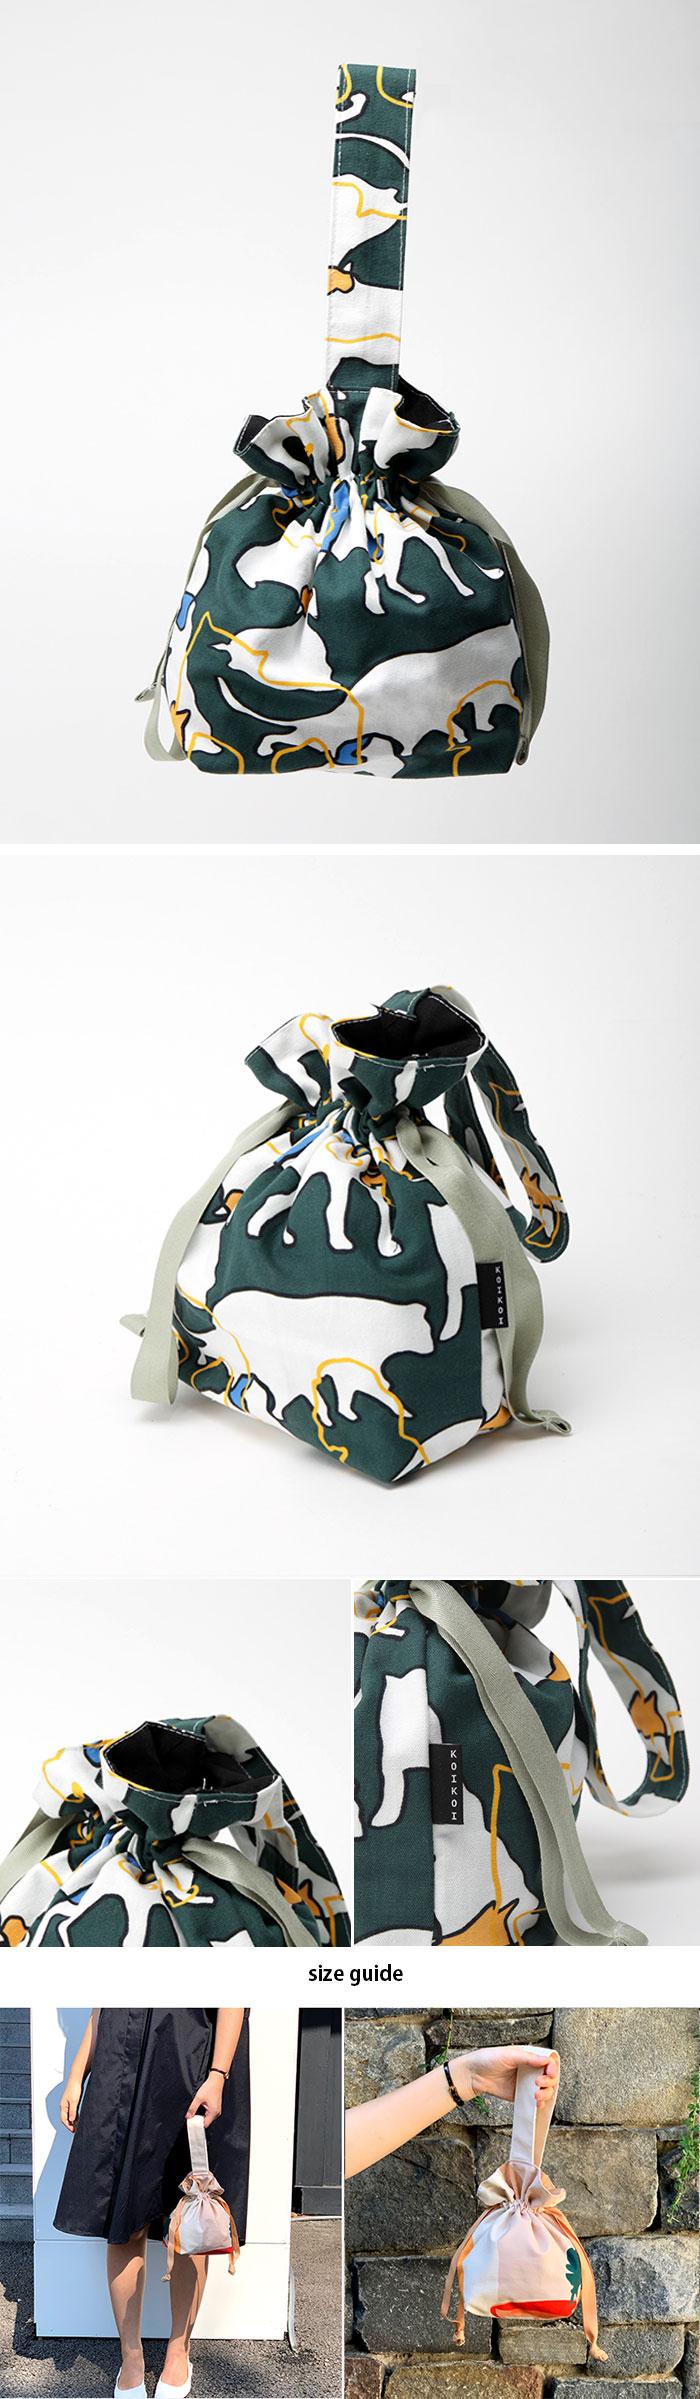 Shilluette mini string bag - 코이코이, 28,000원, 캔버스/에코백, 에코백